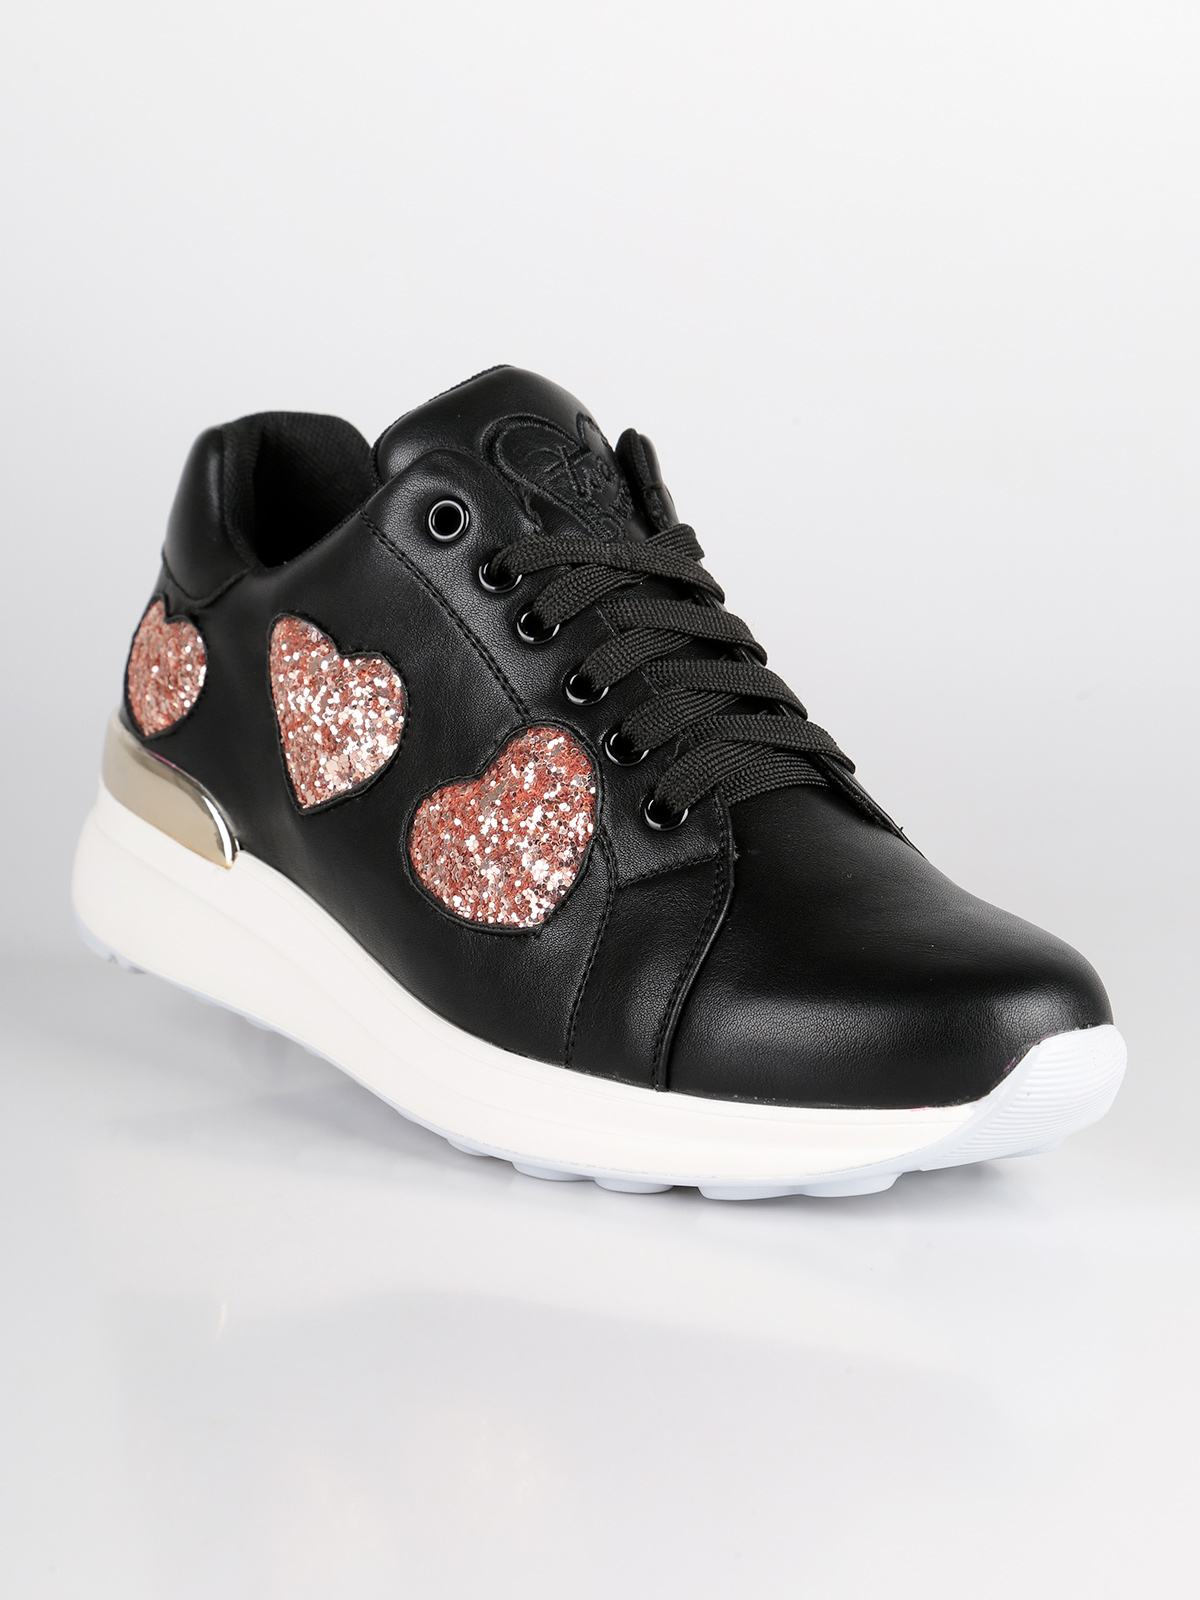 BRACCIALINI Black Sneakers With Hearts Glitter